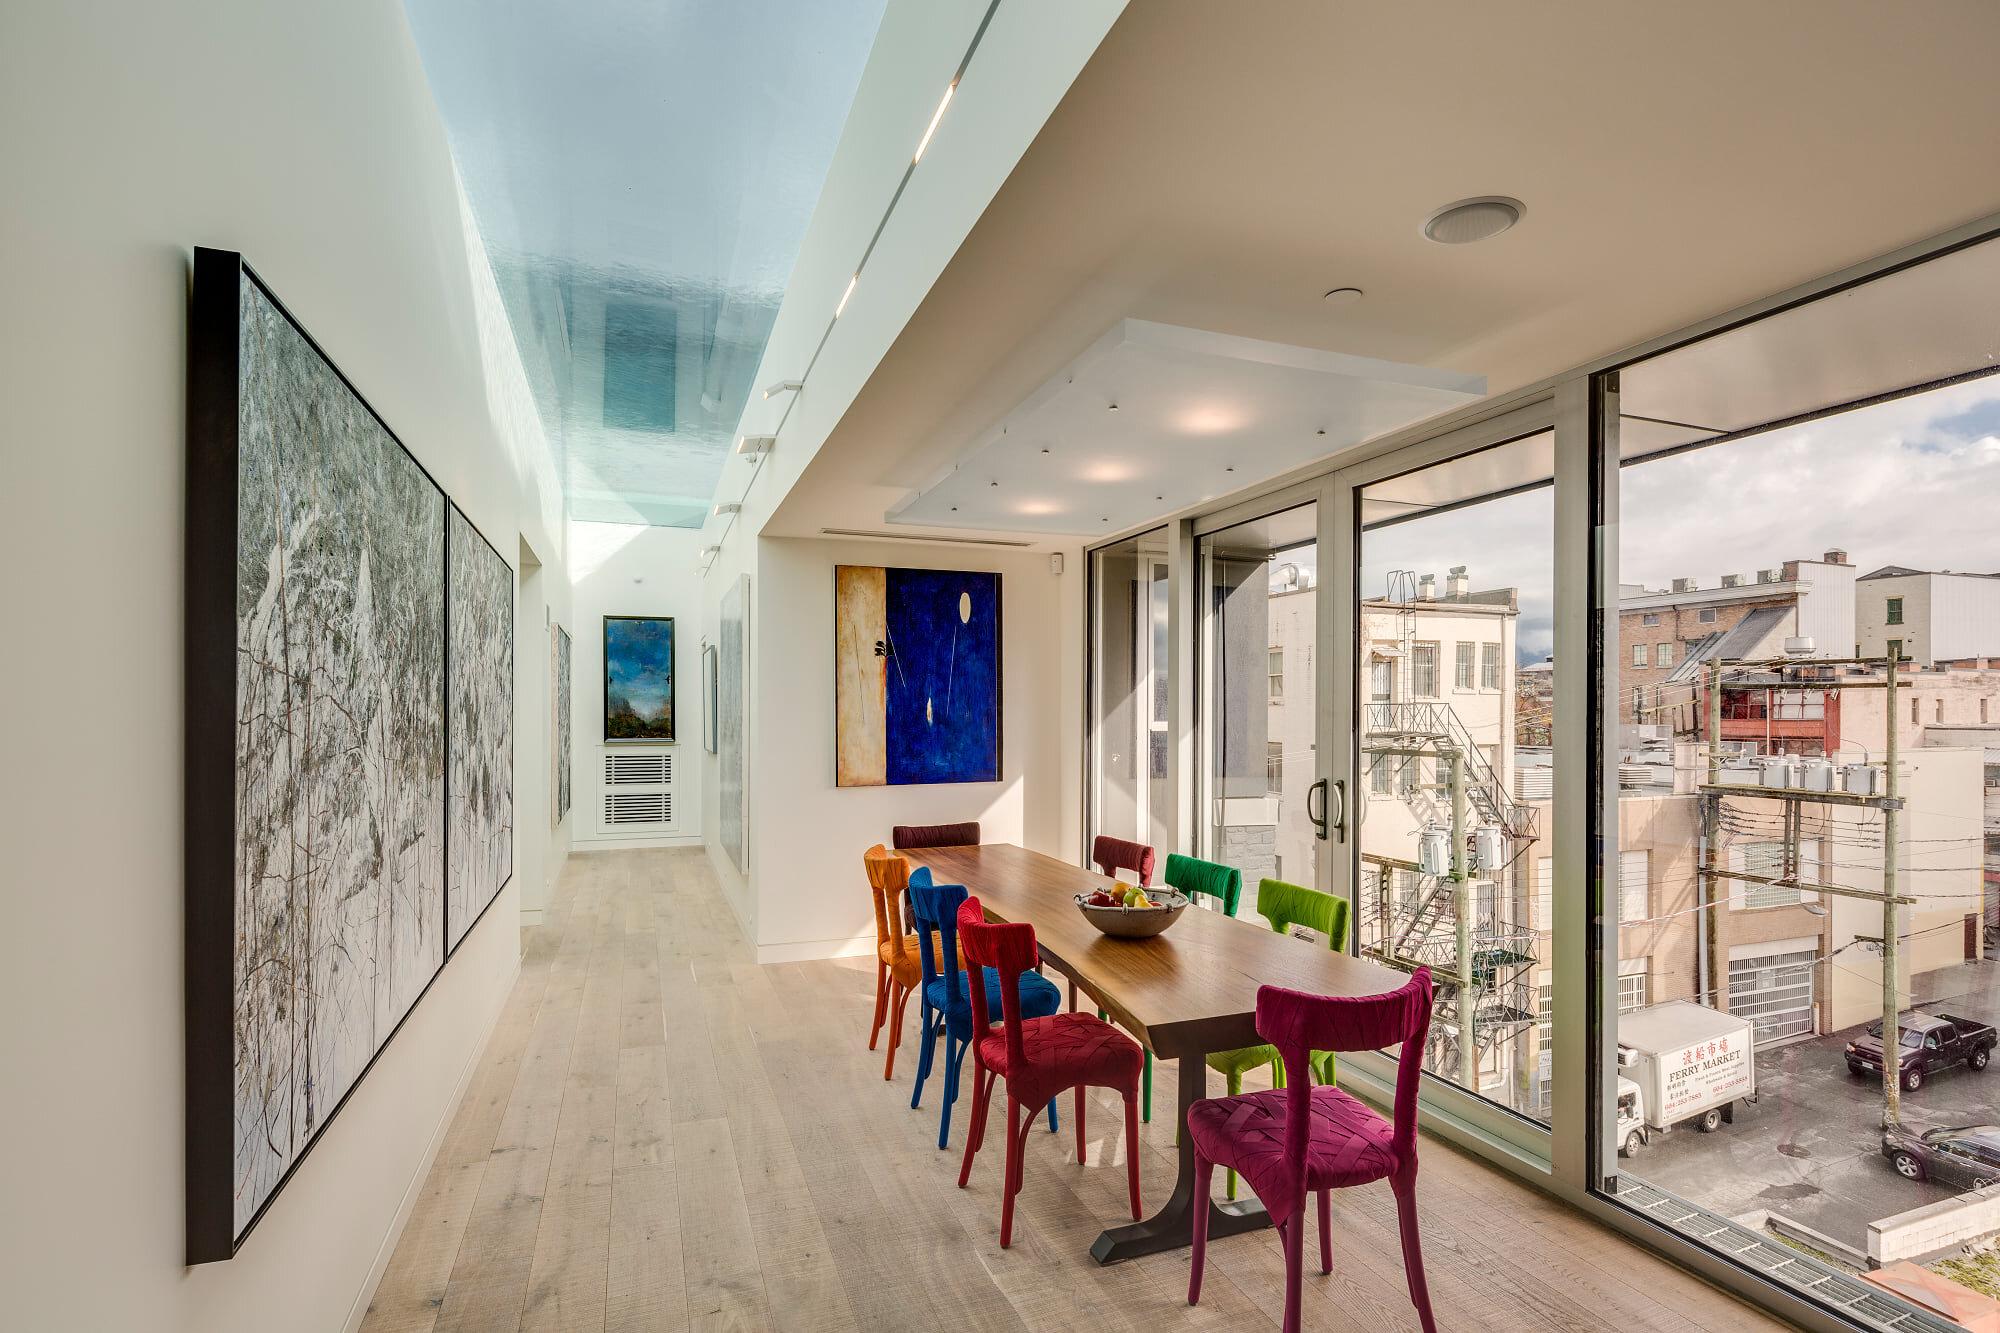 wsi-imageoptim-Dining-area-Modern-Vancouver-apartment.jpg